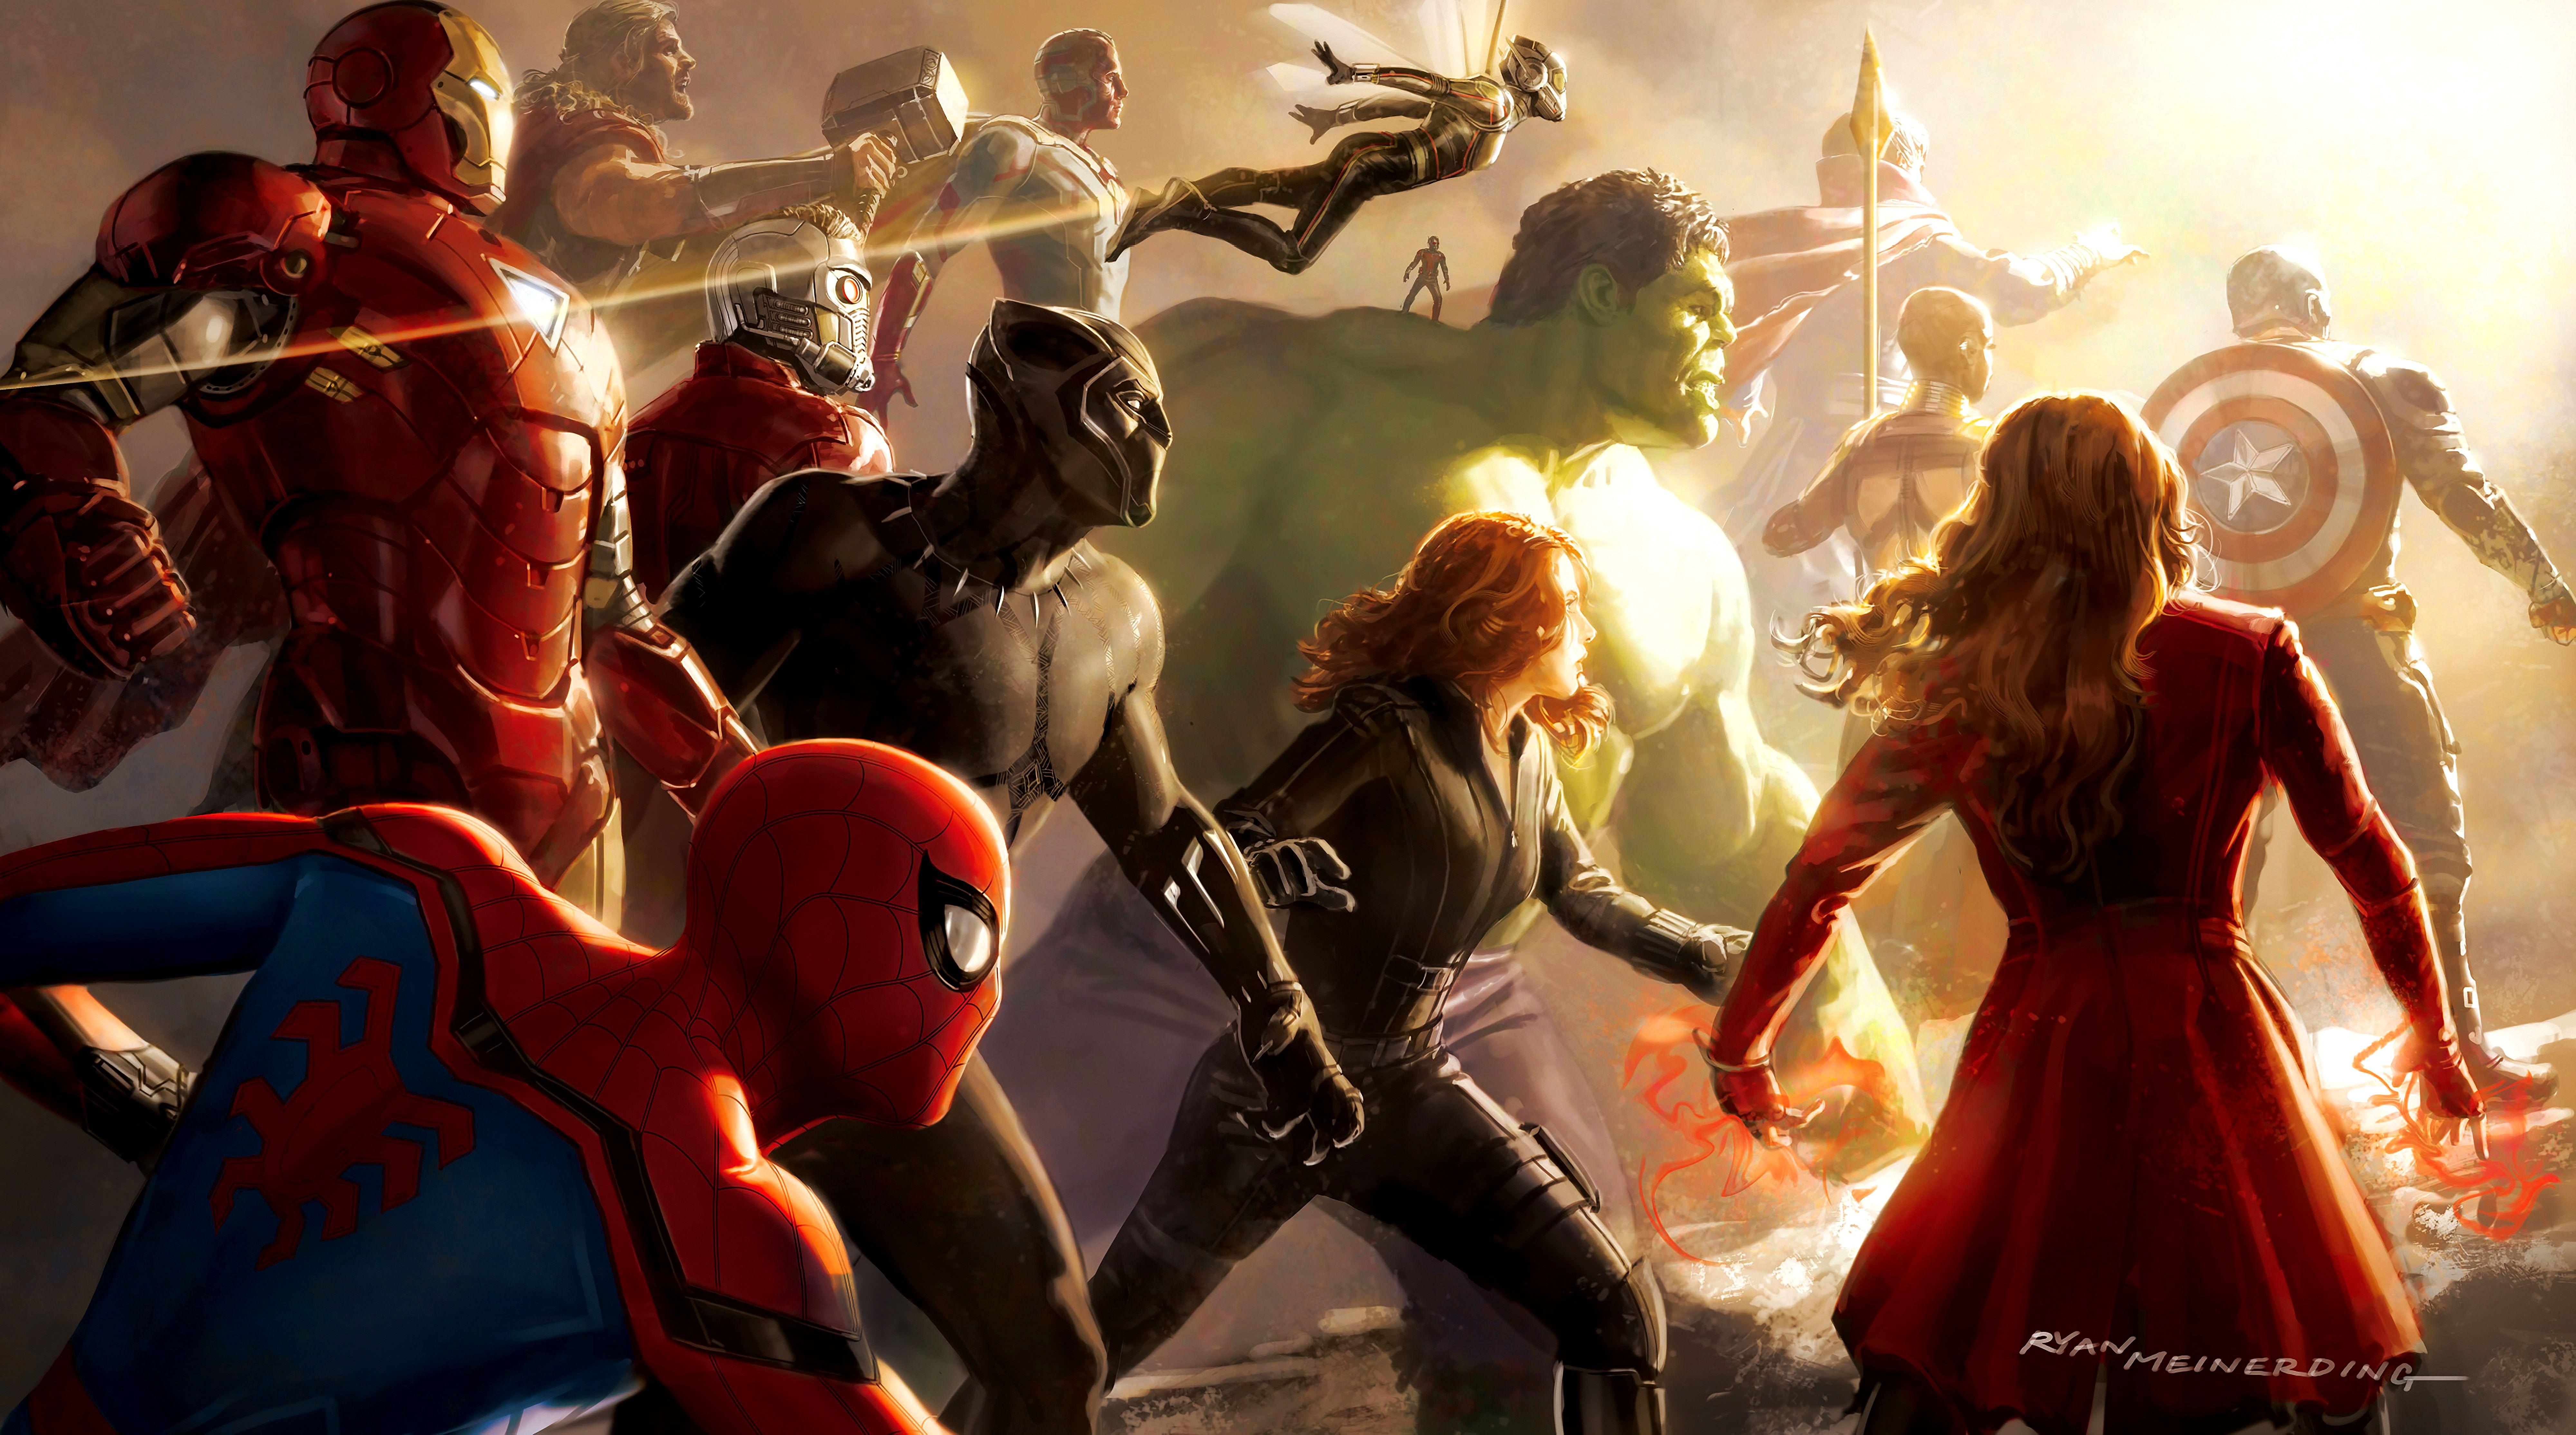 4k Wallpaper For Pc Avengers Infinity War Gallery Papel De Parede Pc Vingadores Marvel